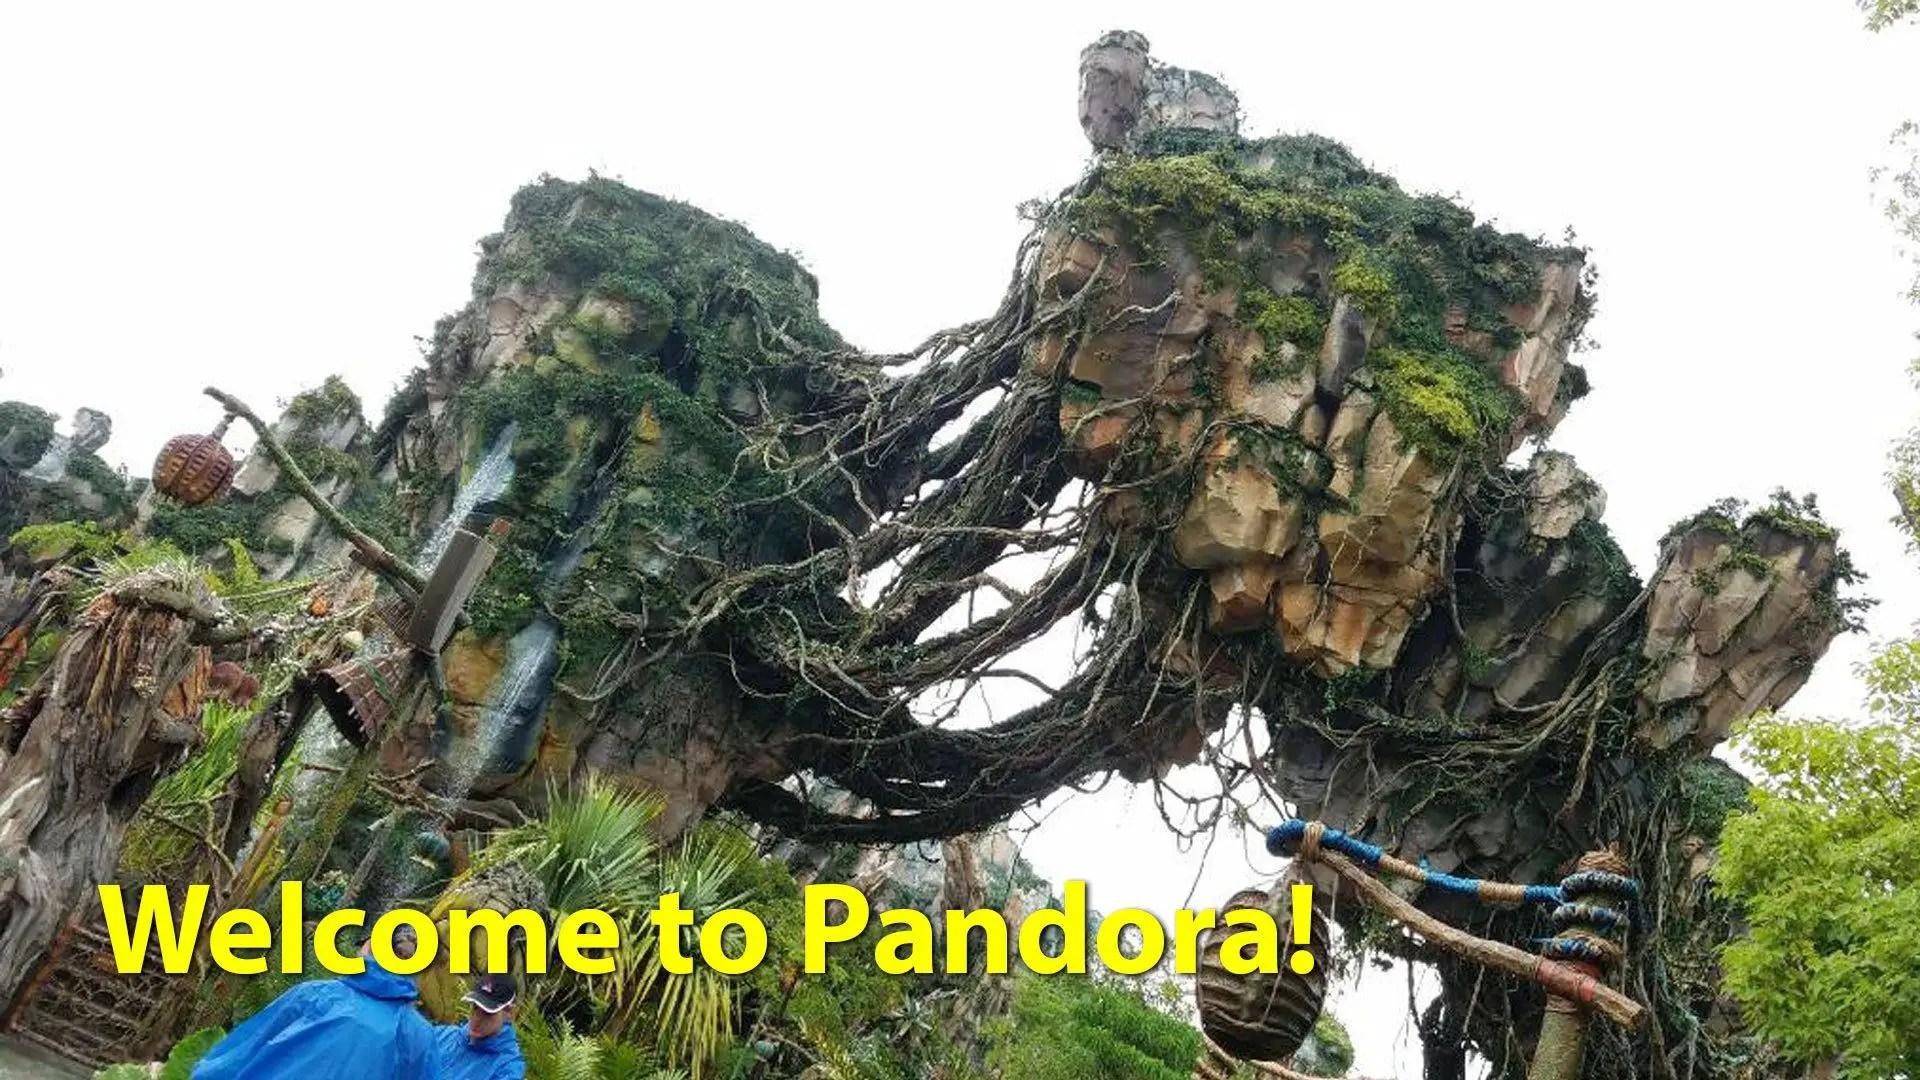 Welcome to Pandora! - Geeks Corner - Episode 636